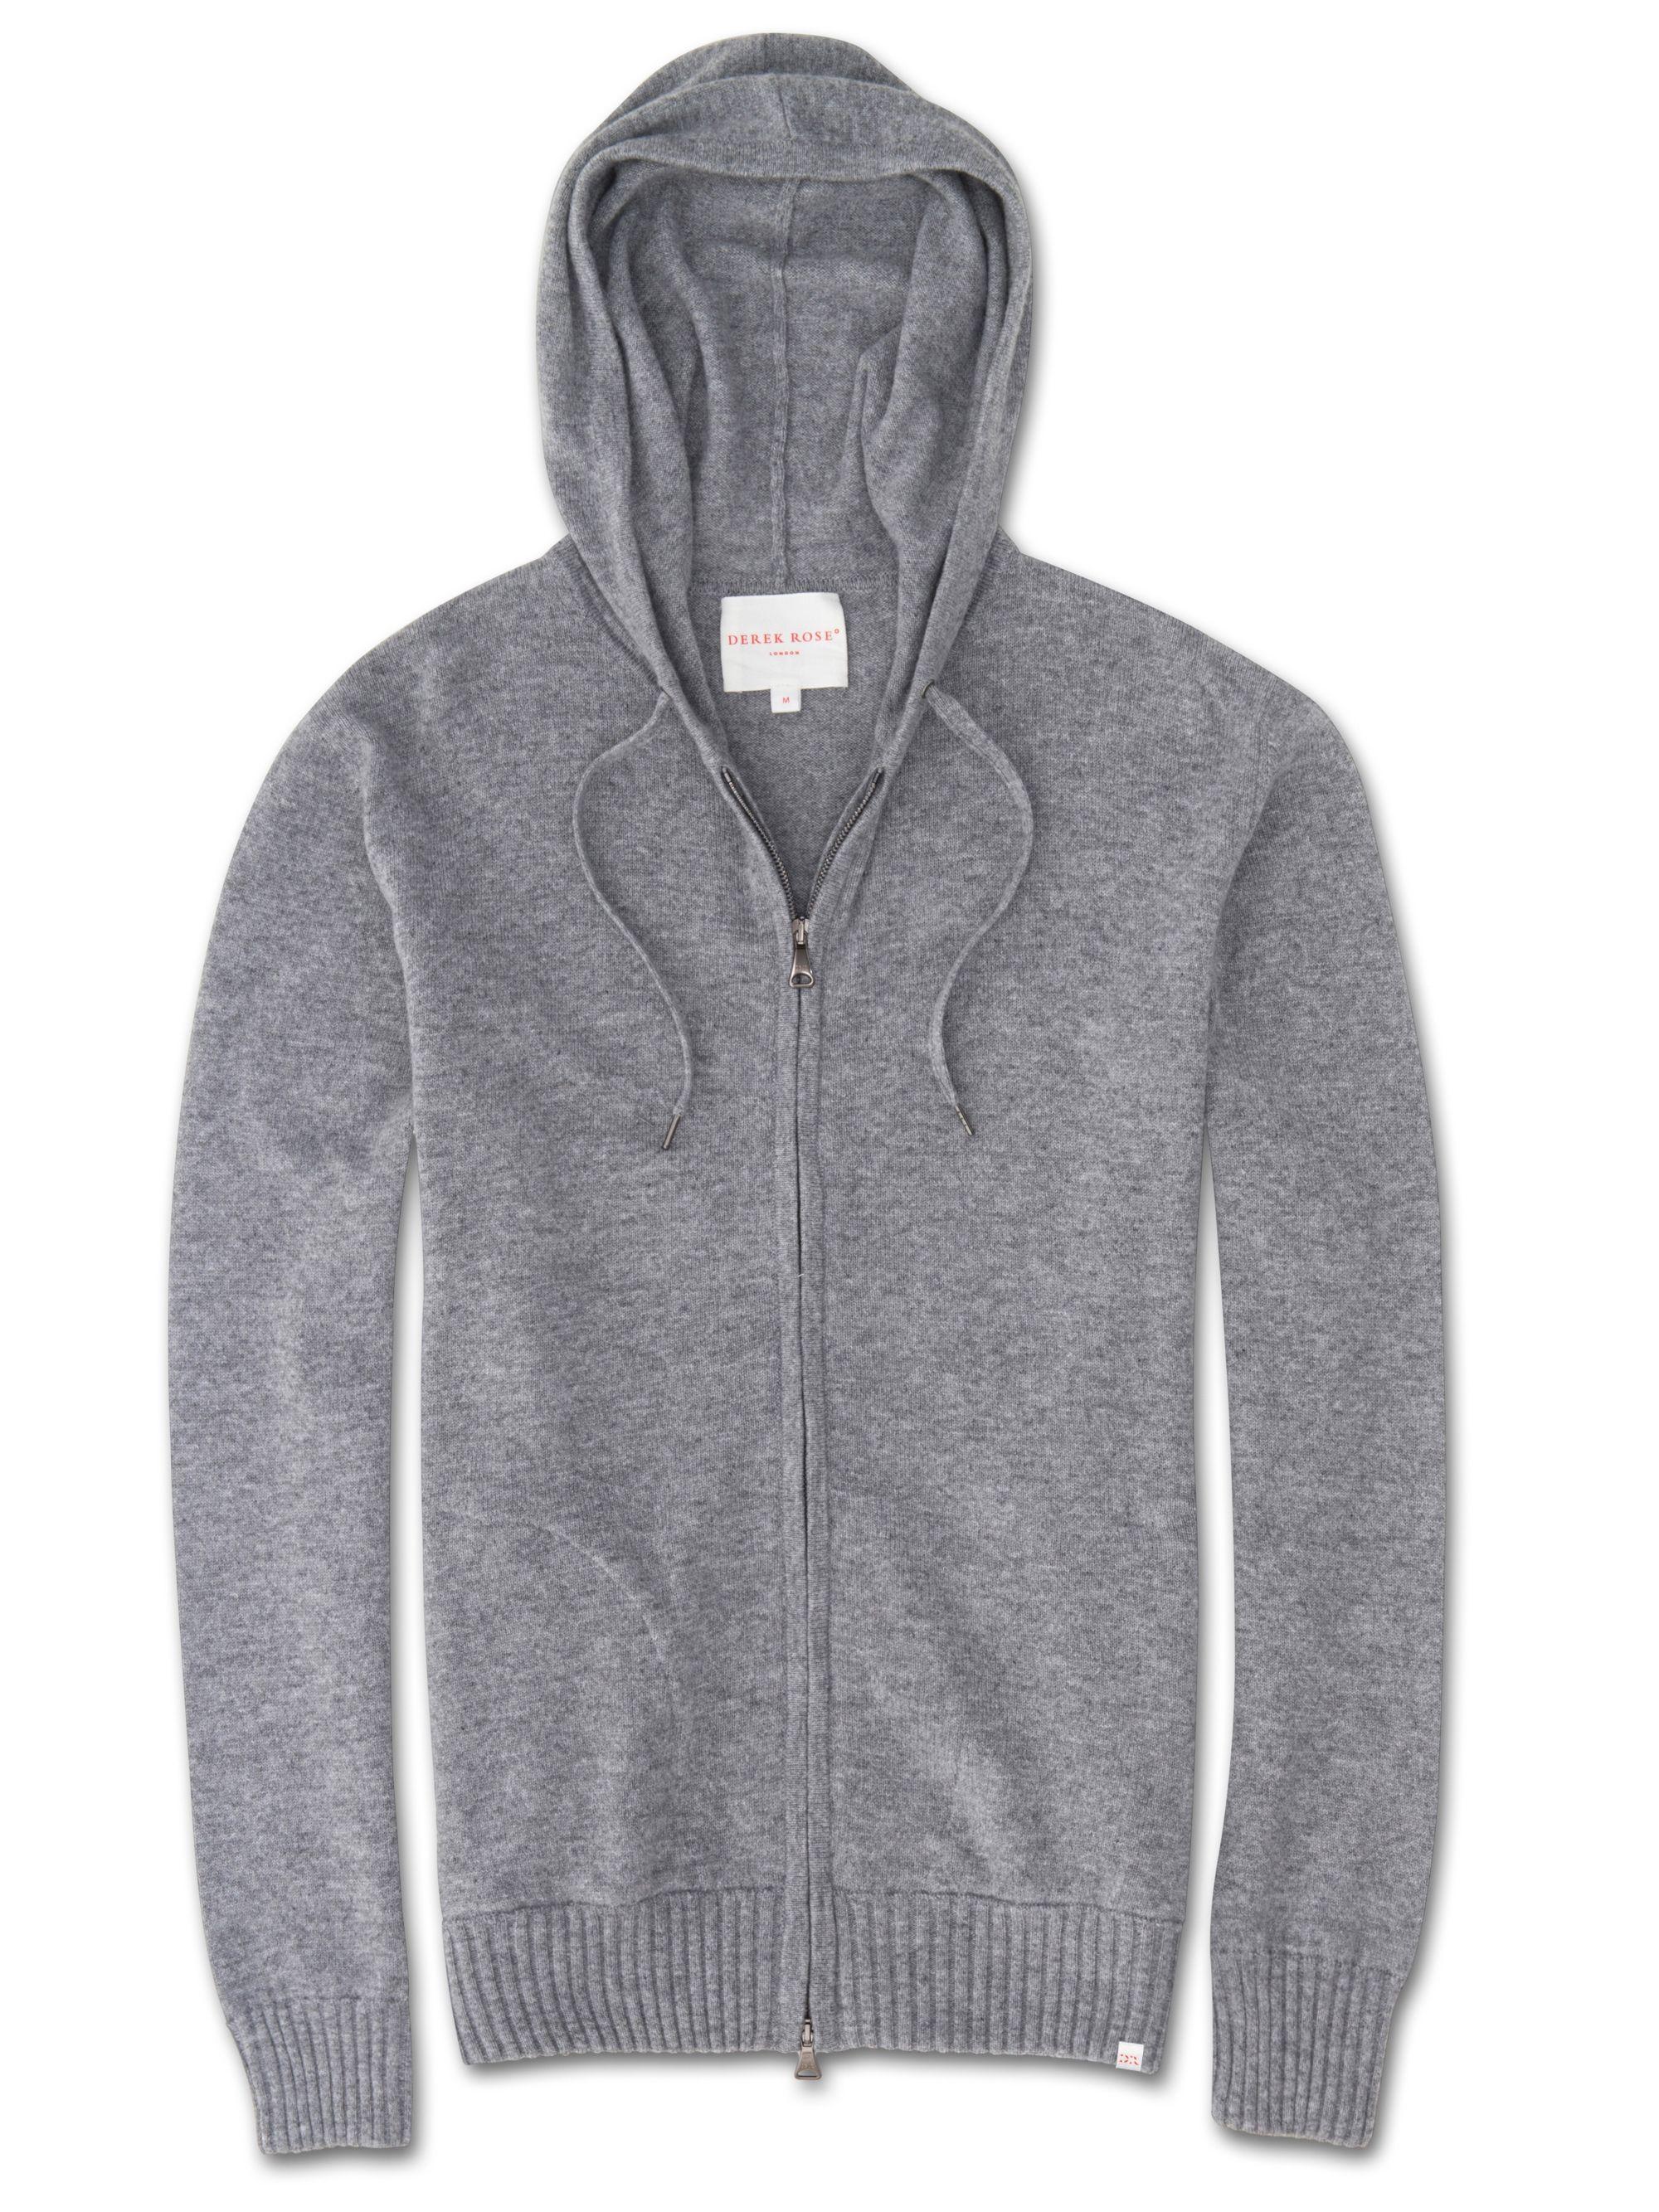 Derek Rose Finley Elange Cashmere Zip Up Hoodie Gray In Grey Modesens Cashmere Hoodie Hoodies Mens Cashmere [ 2667 x 2000 Pixel ]